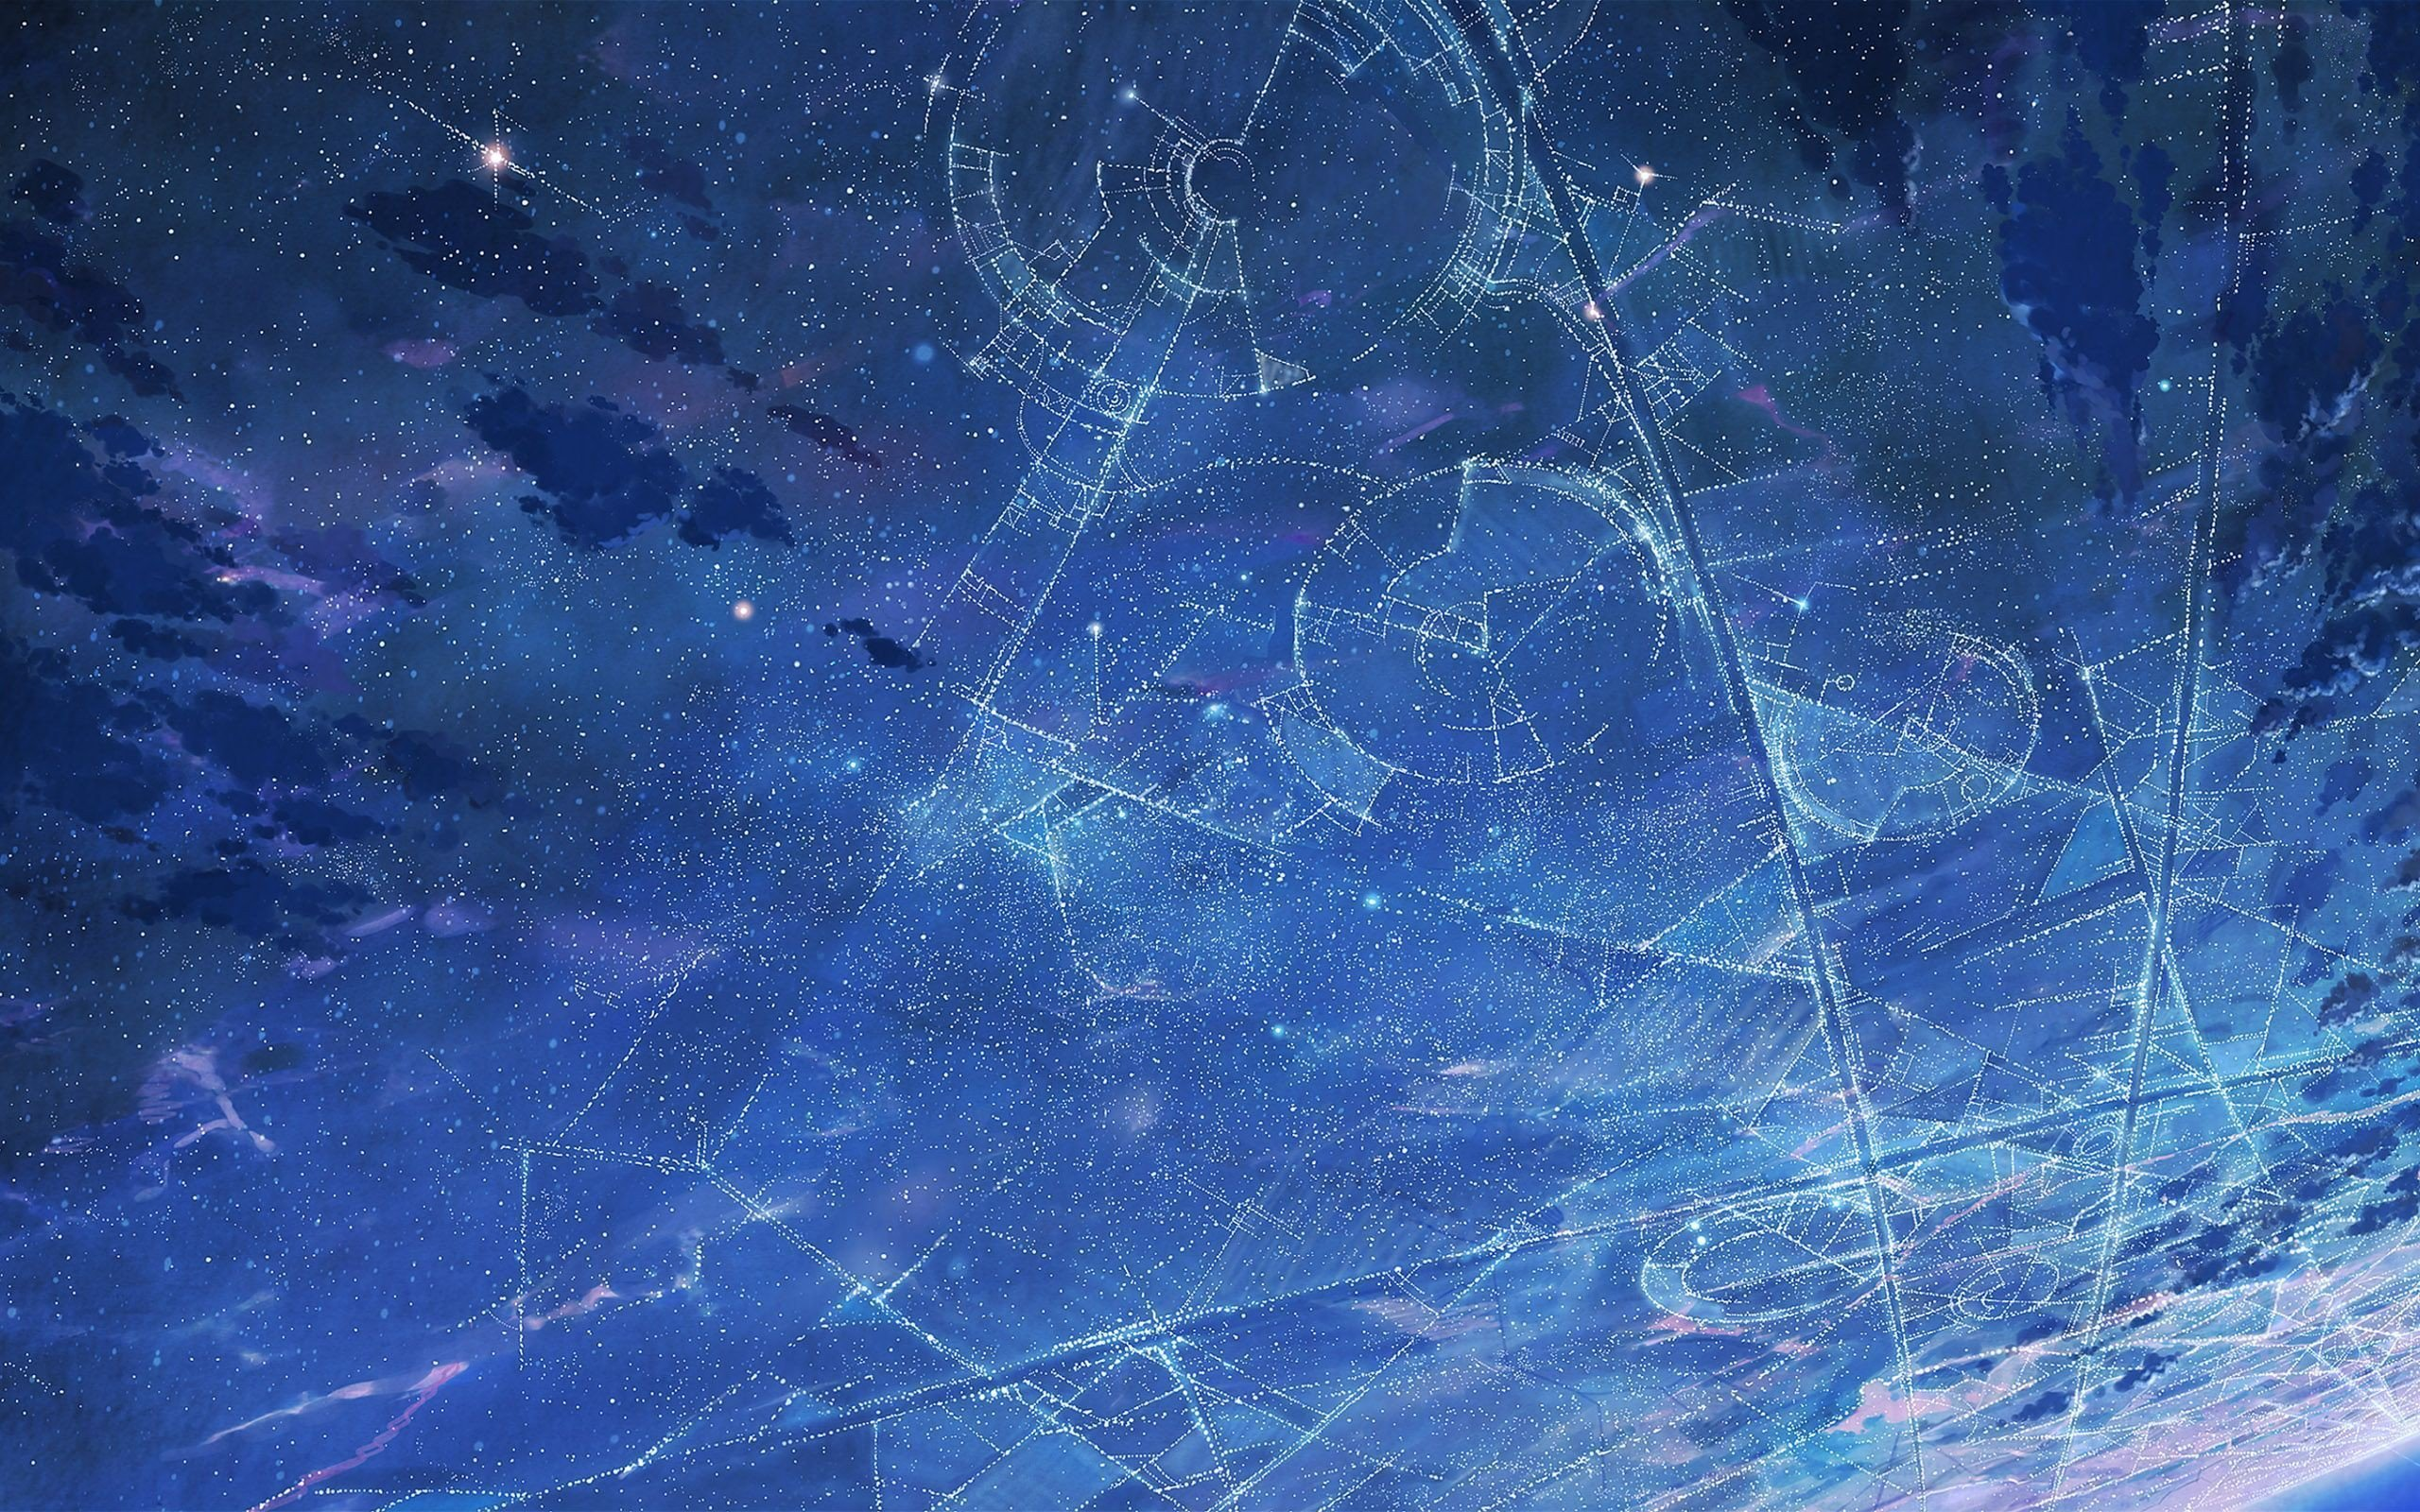 Drawn Star Constellation Hd Wallpaper